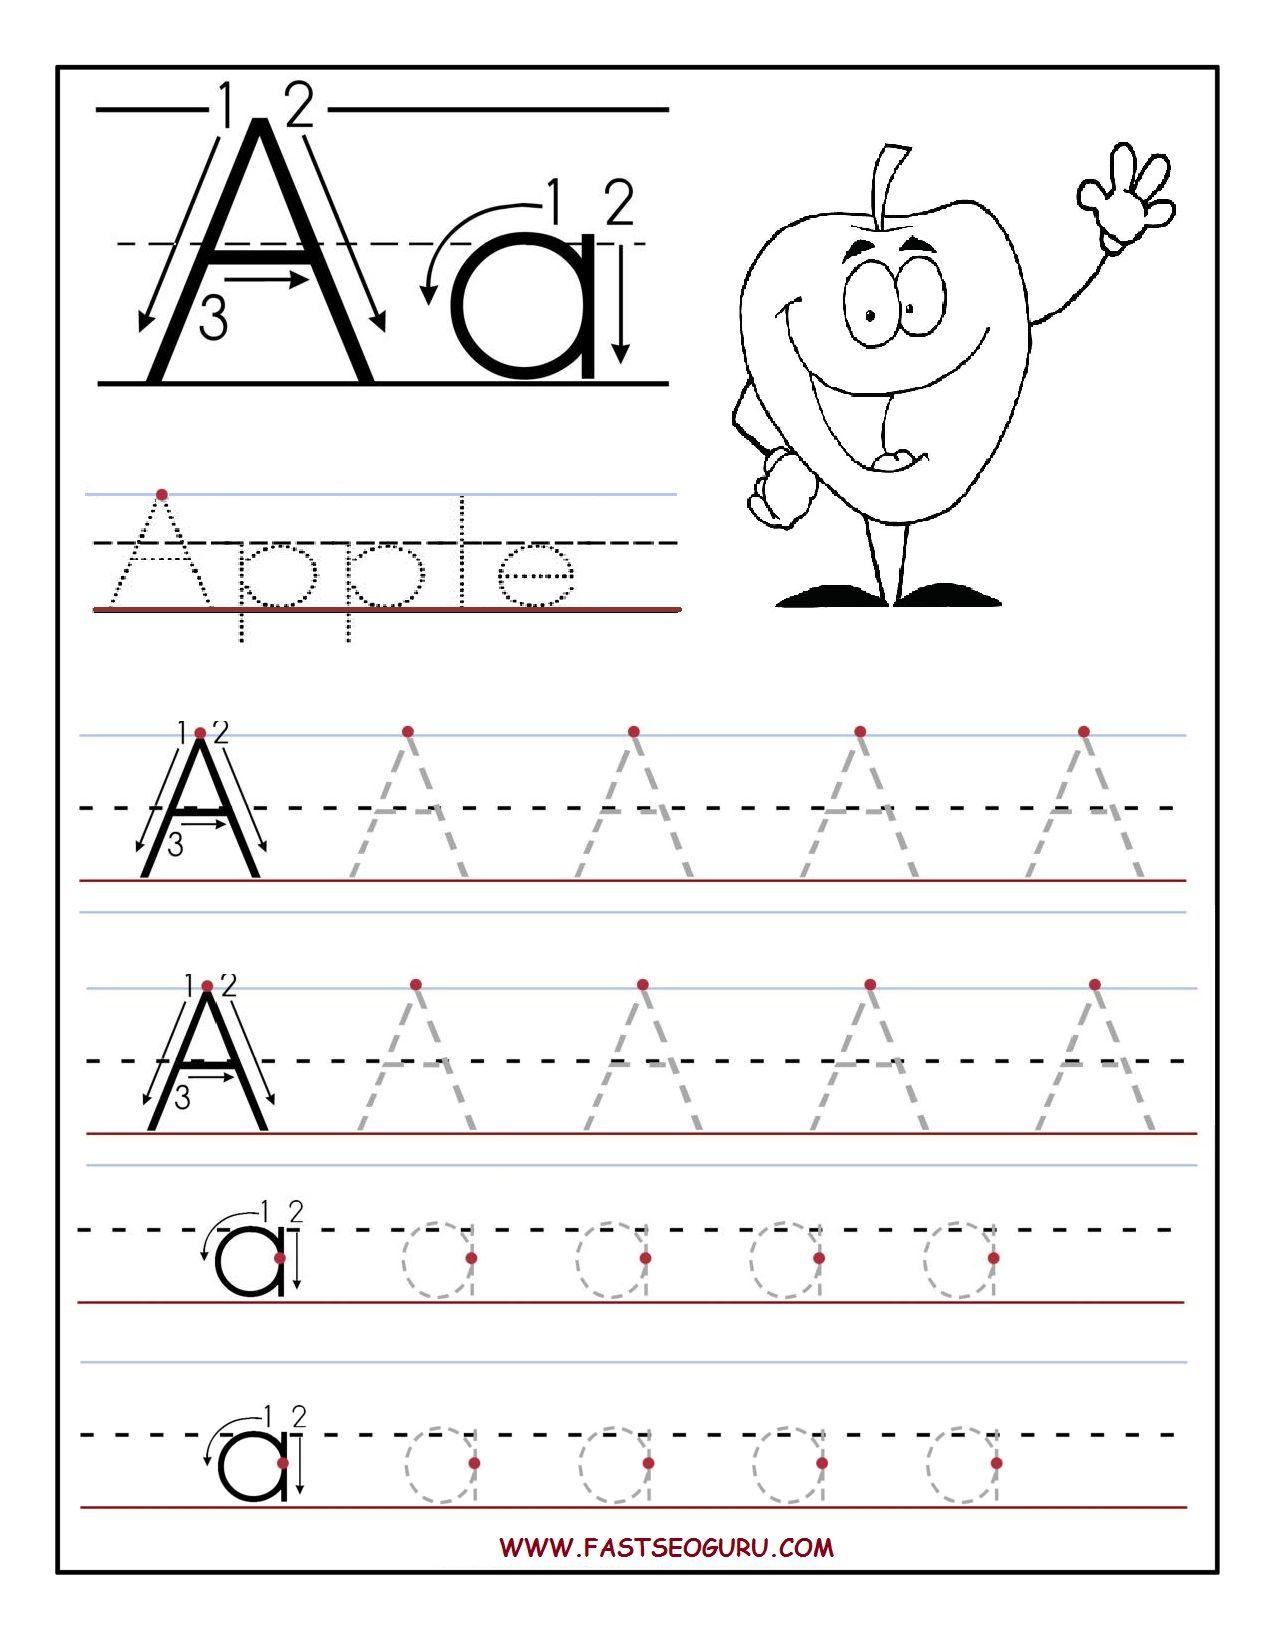 B>Free</b> <B>Printable</b> Letter A Tracing <B>Worksheets</b - Free Printable Activities For Preschoolers